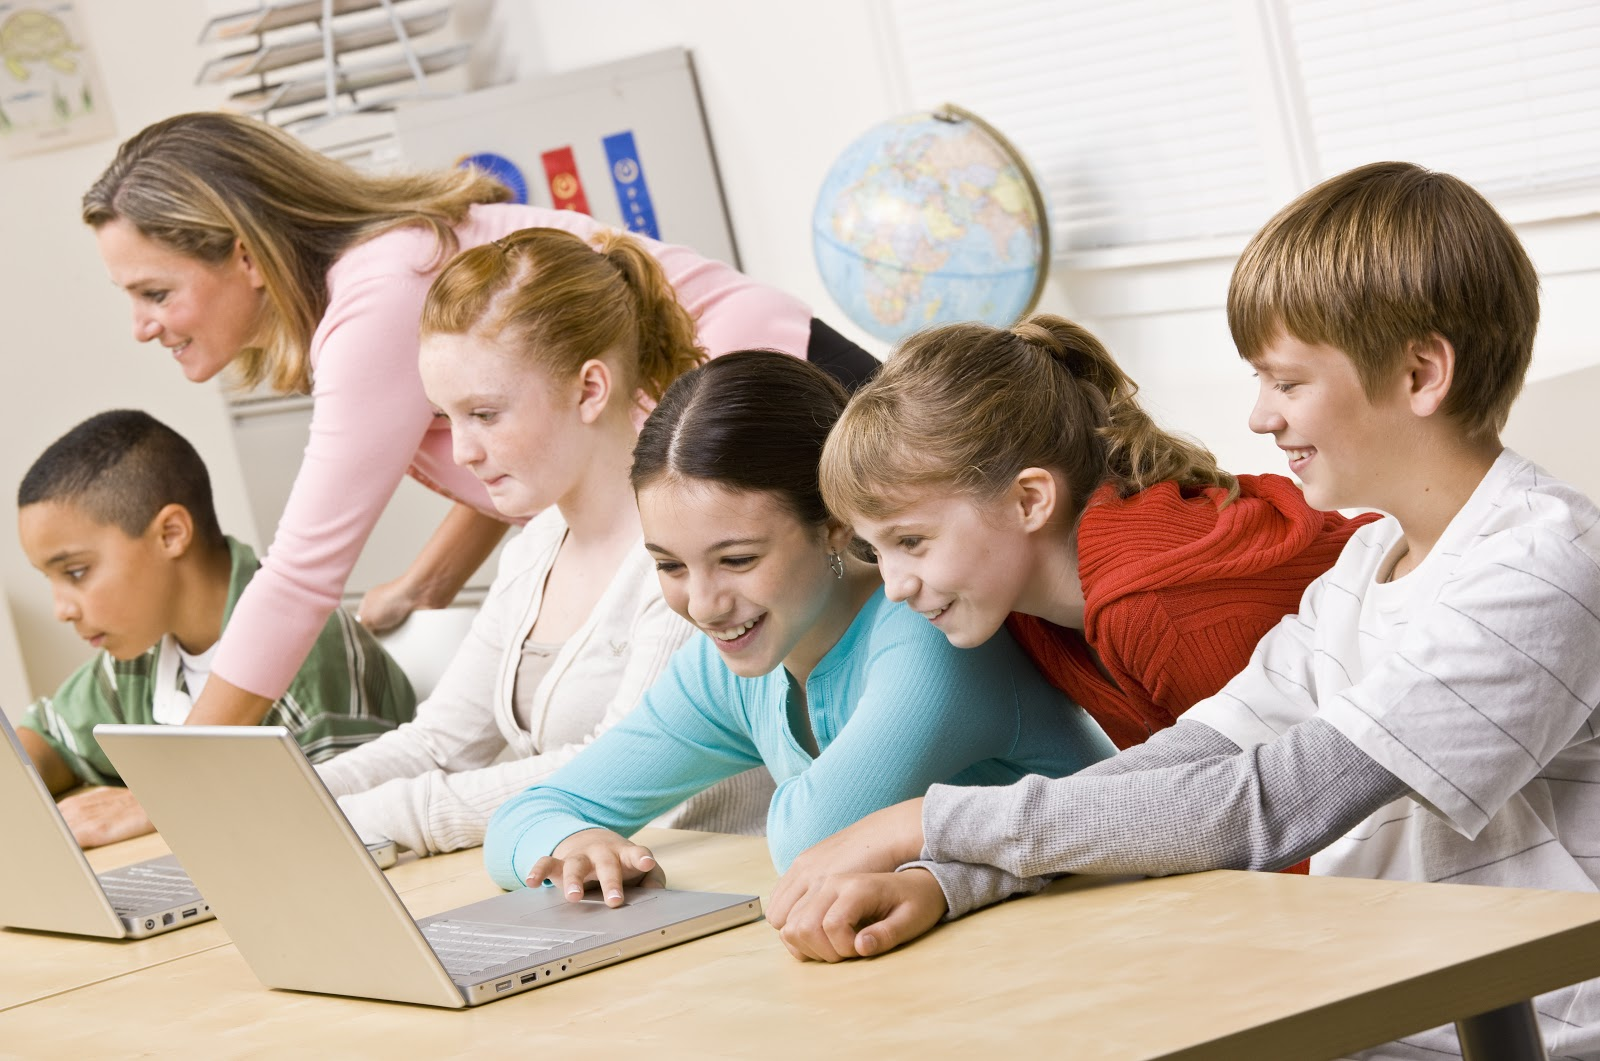 Laptop Classroom AdobeStock 21075777